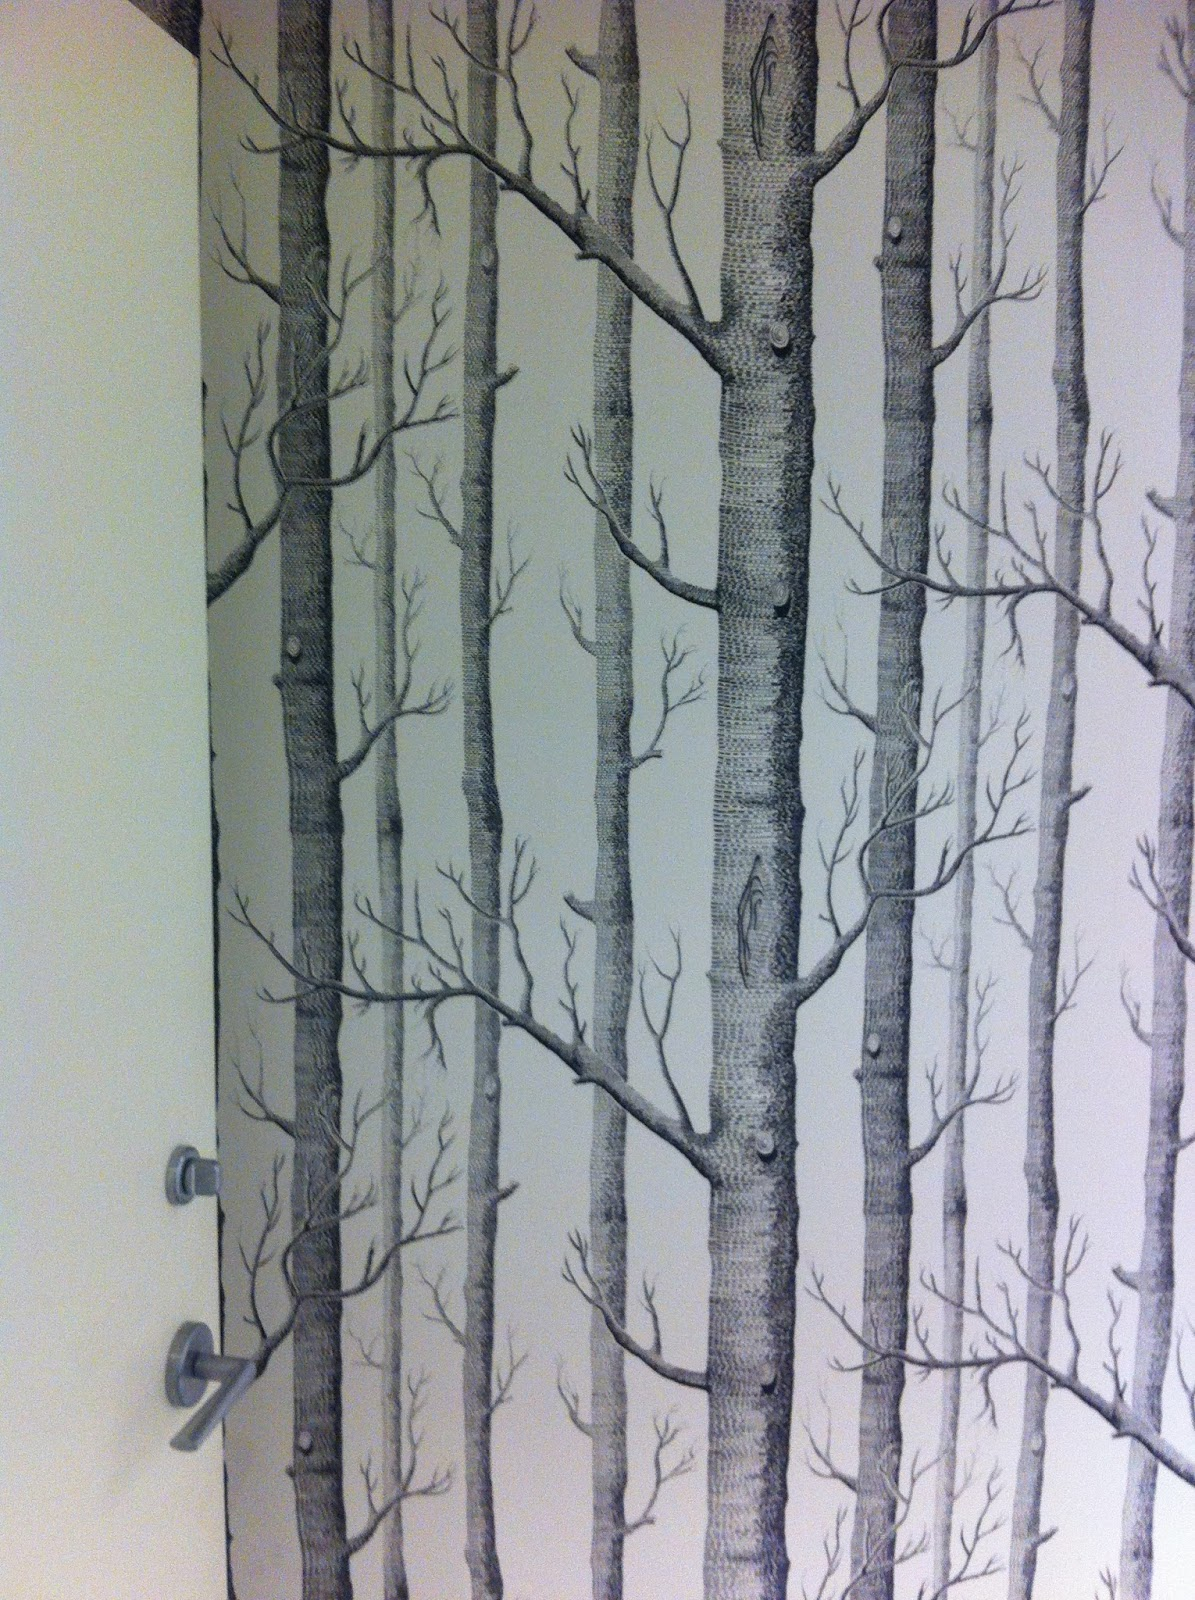 pose papier peint mural adhésif sticker repositionnable design